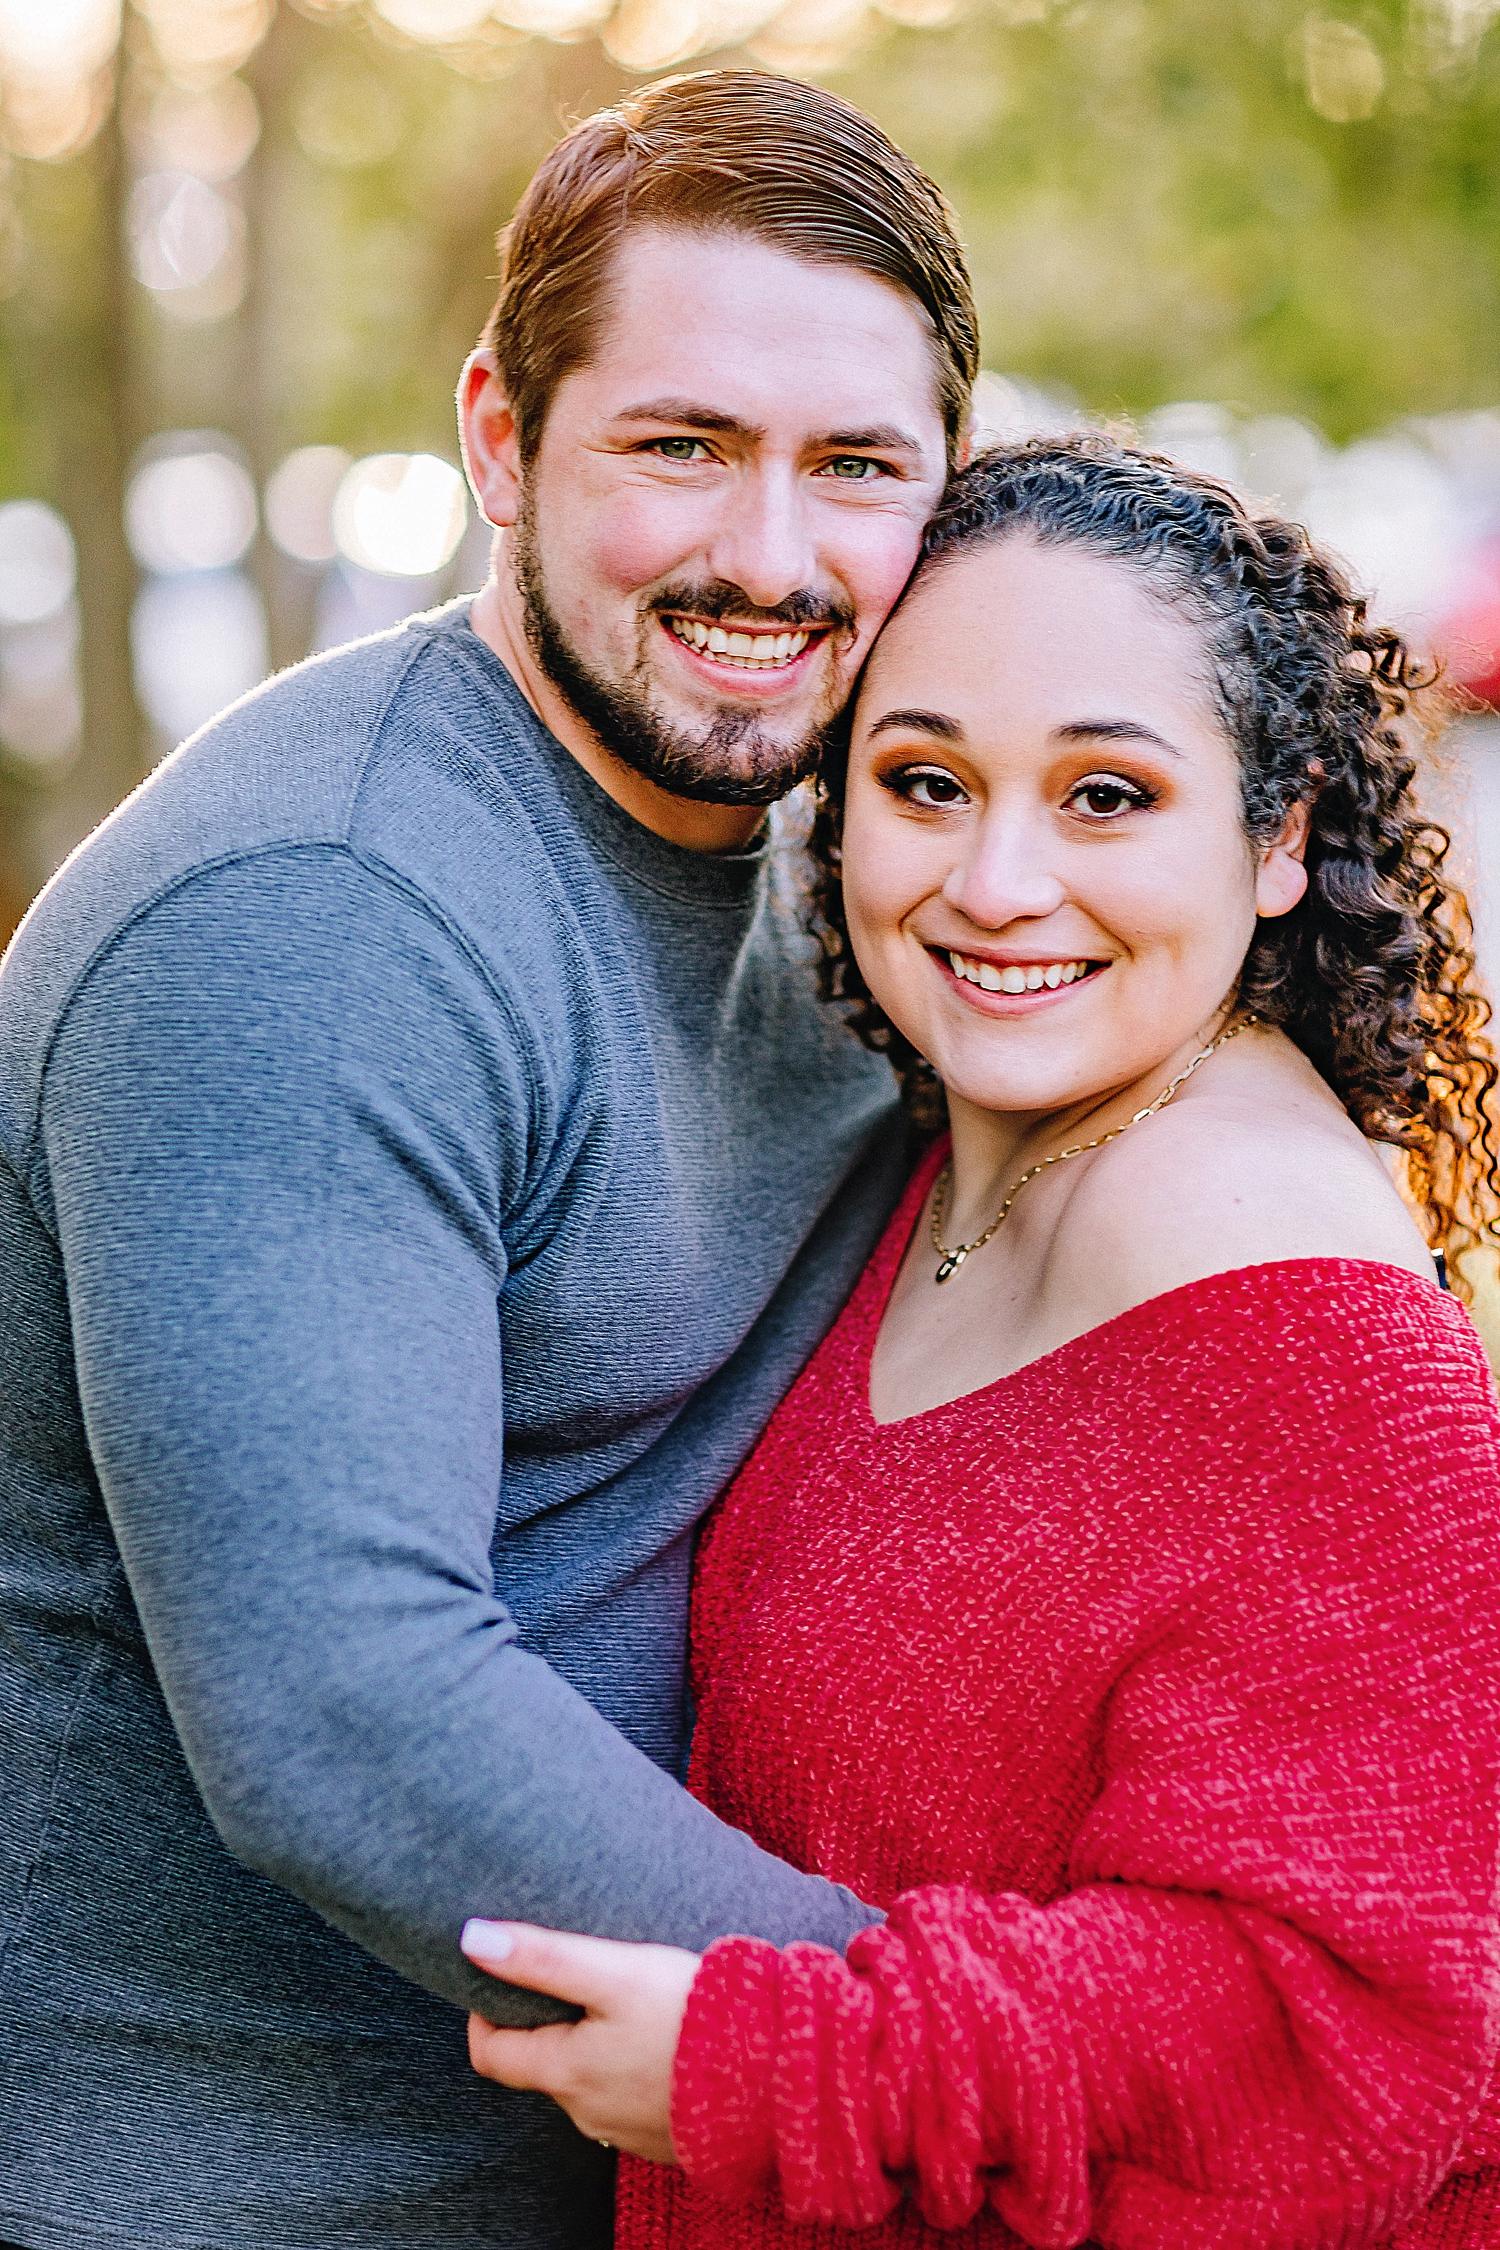 Engagement-photo-session-gruene-new-braunfels-texas-carly-barton-photography_0001.jpg